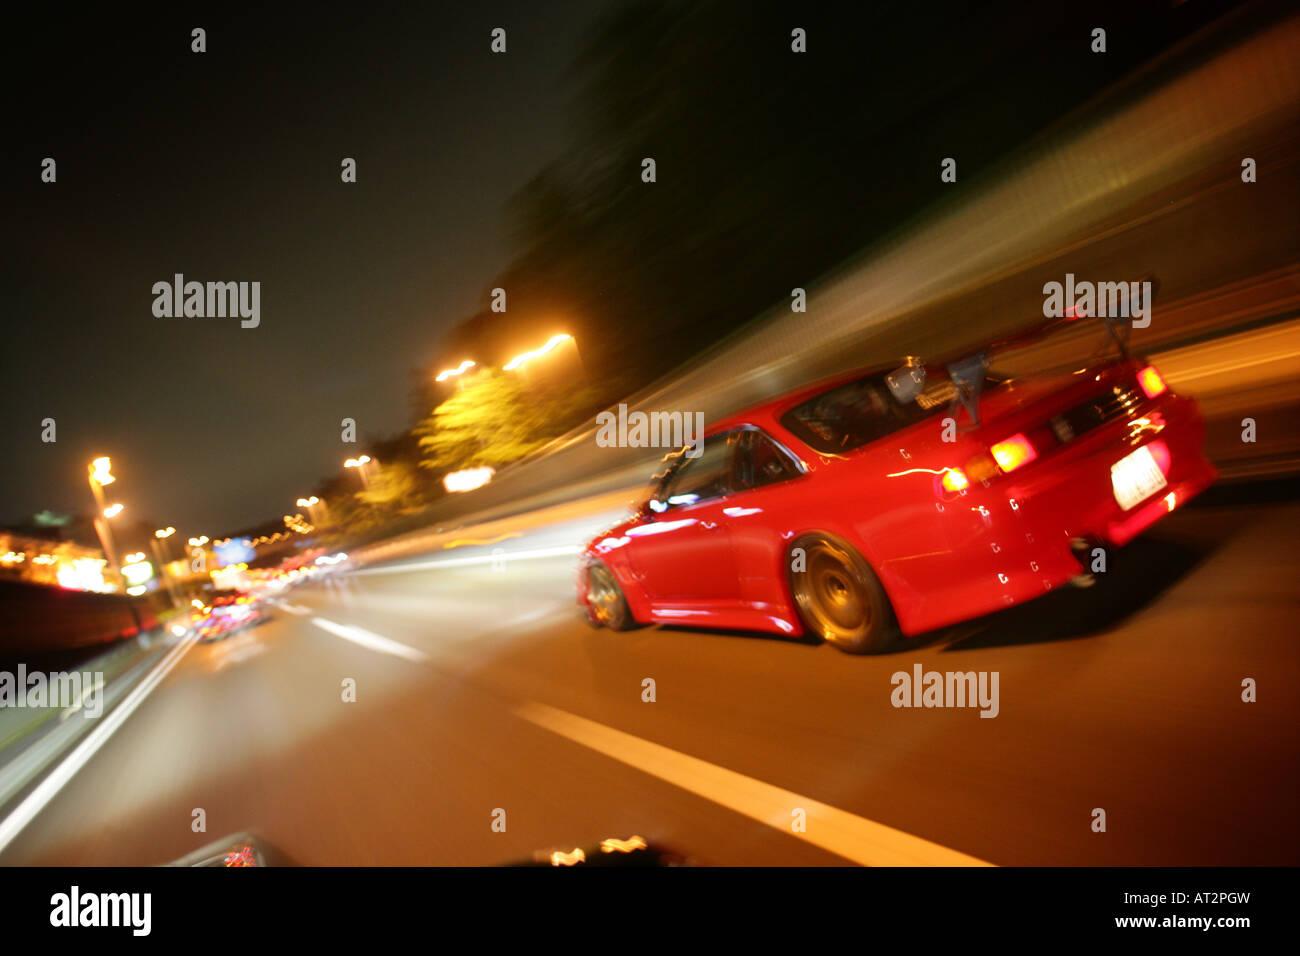 Street Racing In Tokyo Japan Stock Photo 16183080 Alamy